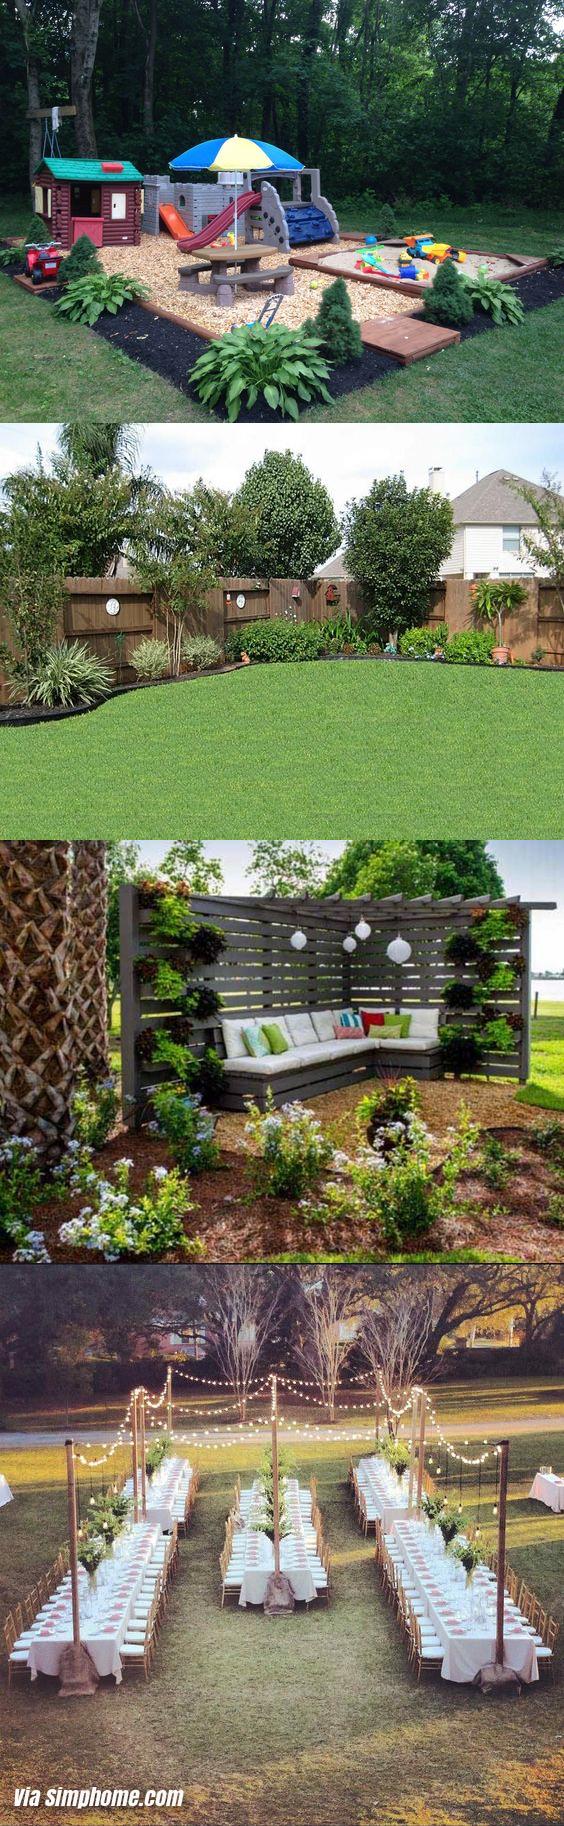 backyard and gadening ideas via Simphome